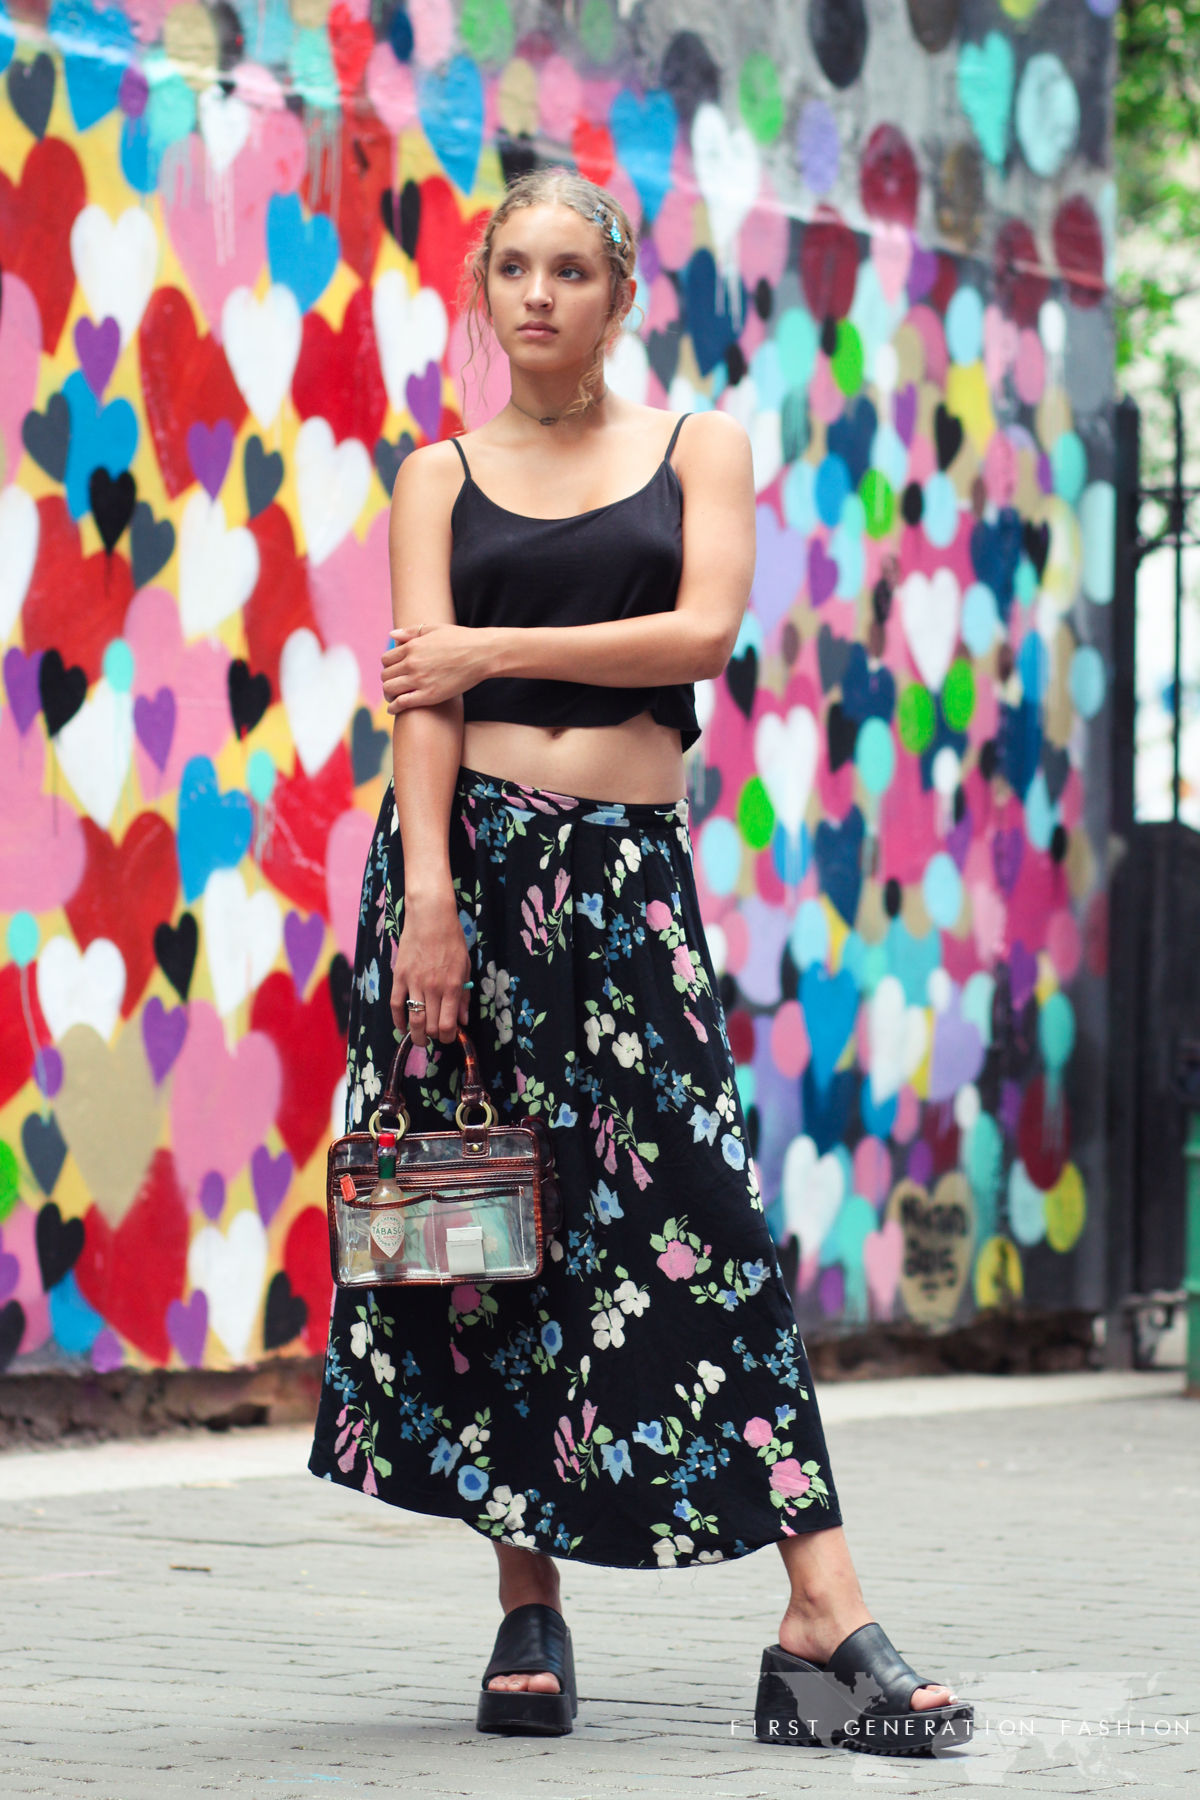 Ivy First Generation Fashion